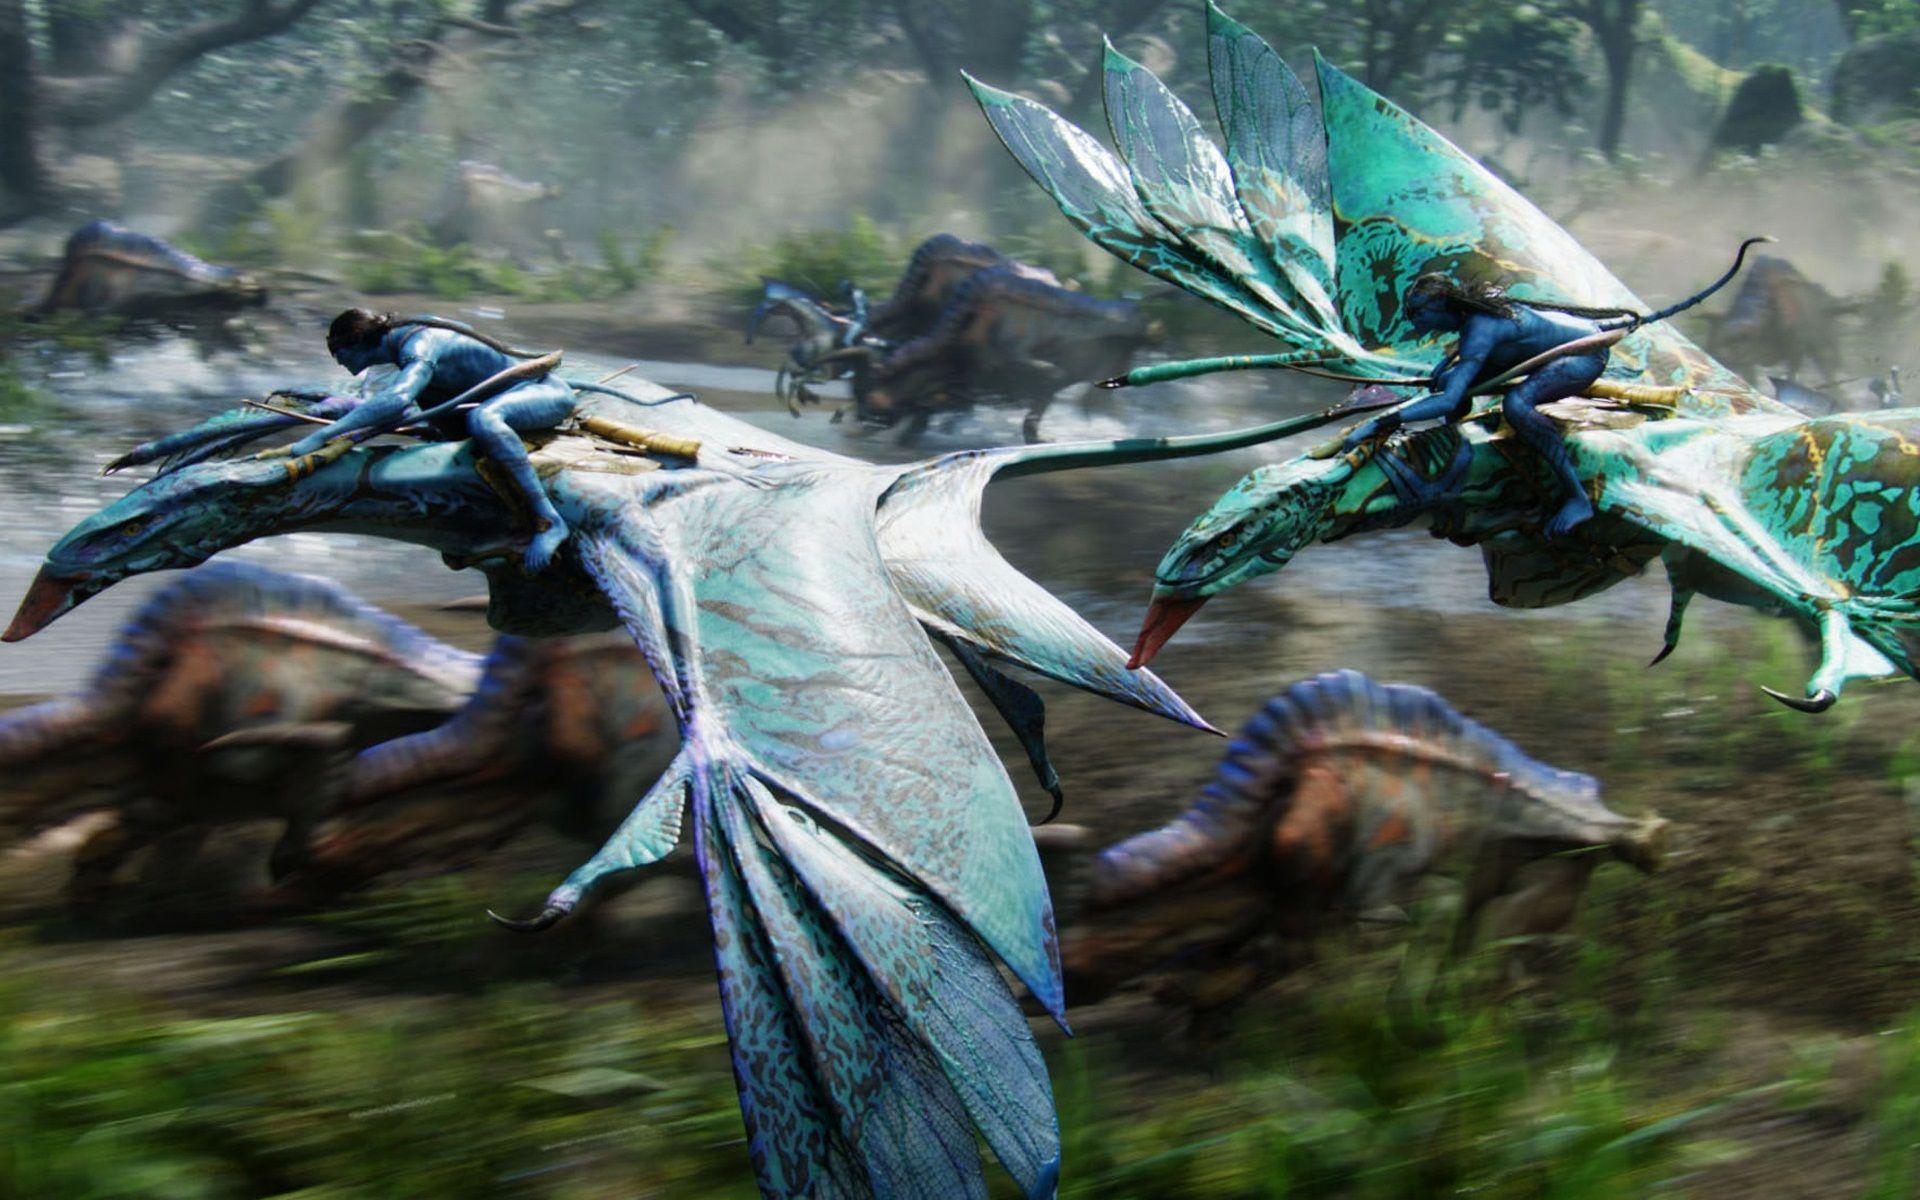 Amazing Wallpaper Movie Avatar 2 - db67f6e675d7a51eeee18dc7fea94ed2  Collection_28180.jpg